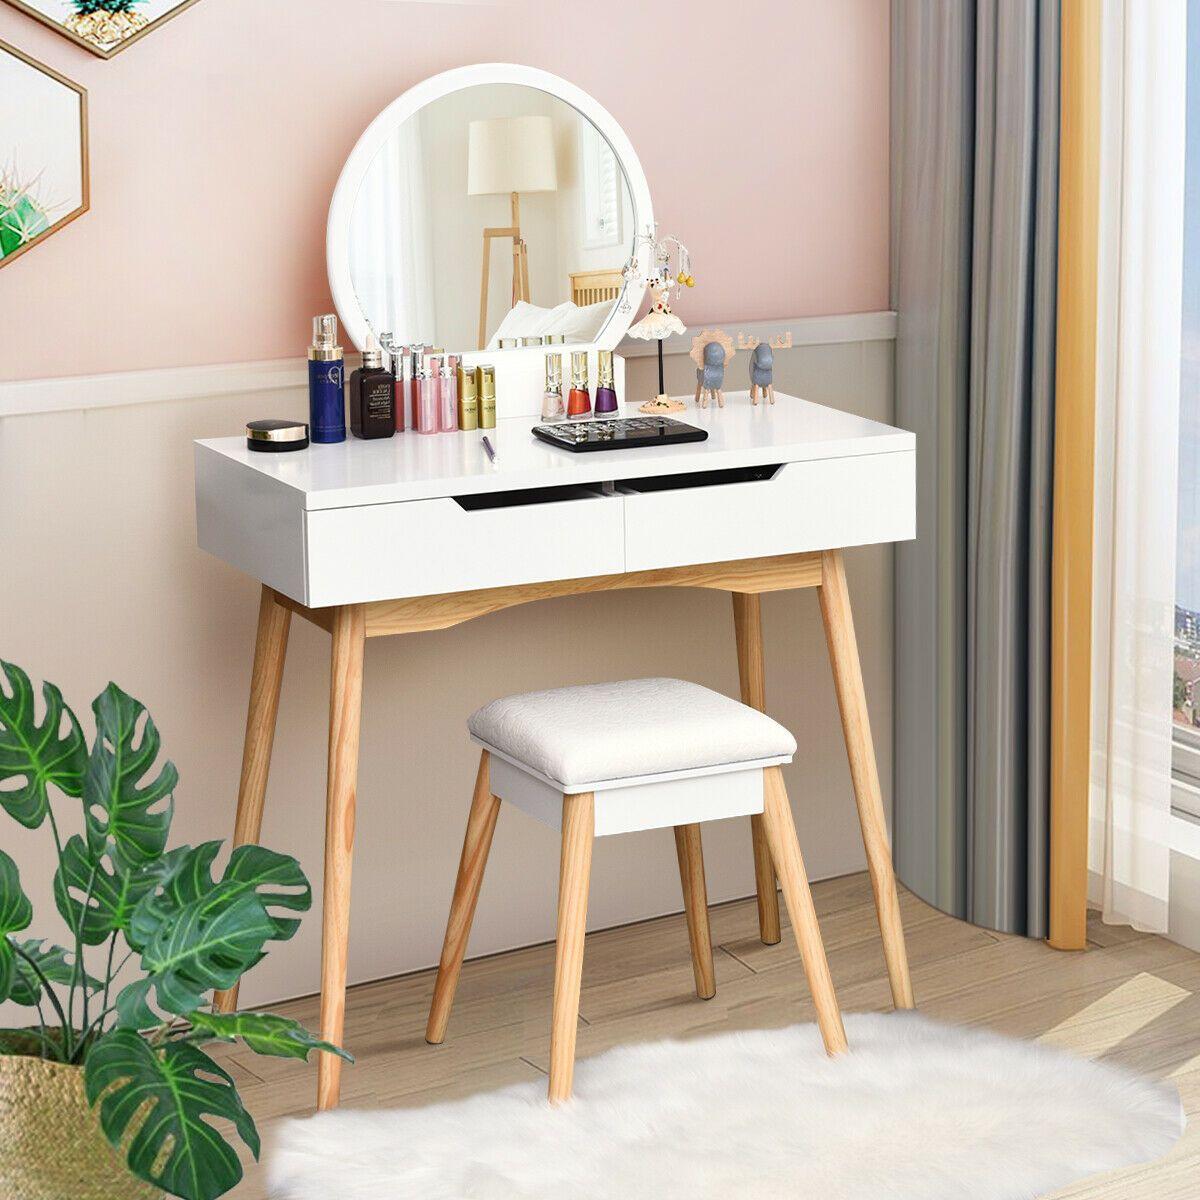 Makeup Vanity Table Set With Round Mirror Dressing Table White Vanity Table Set Small Vanity Table Vanity Table